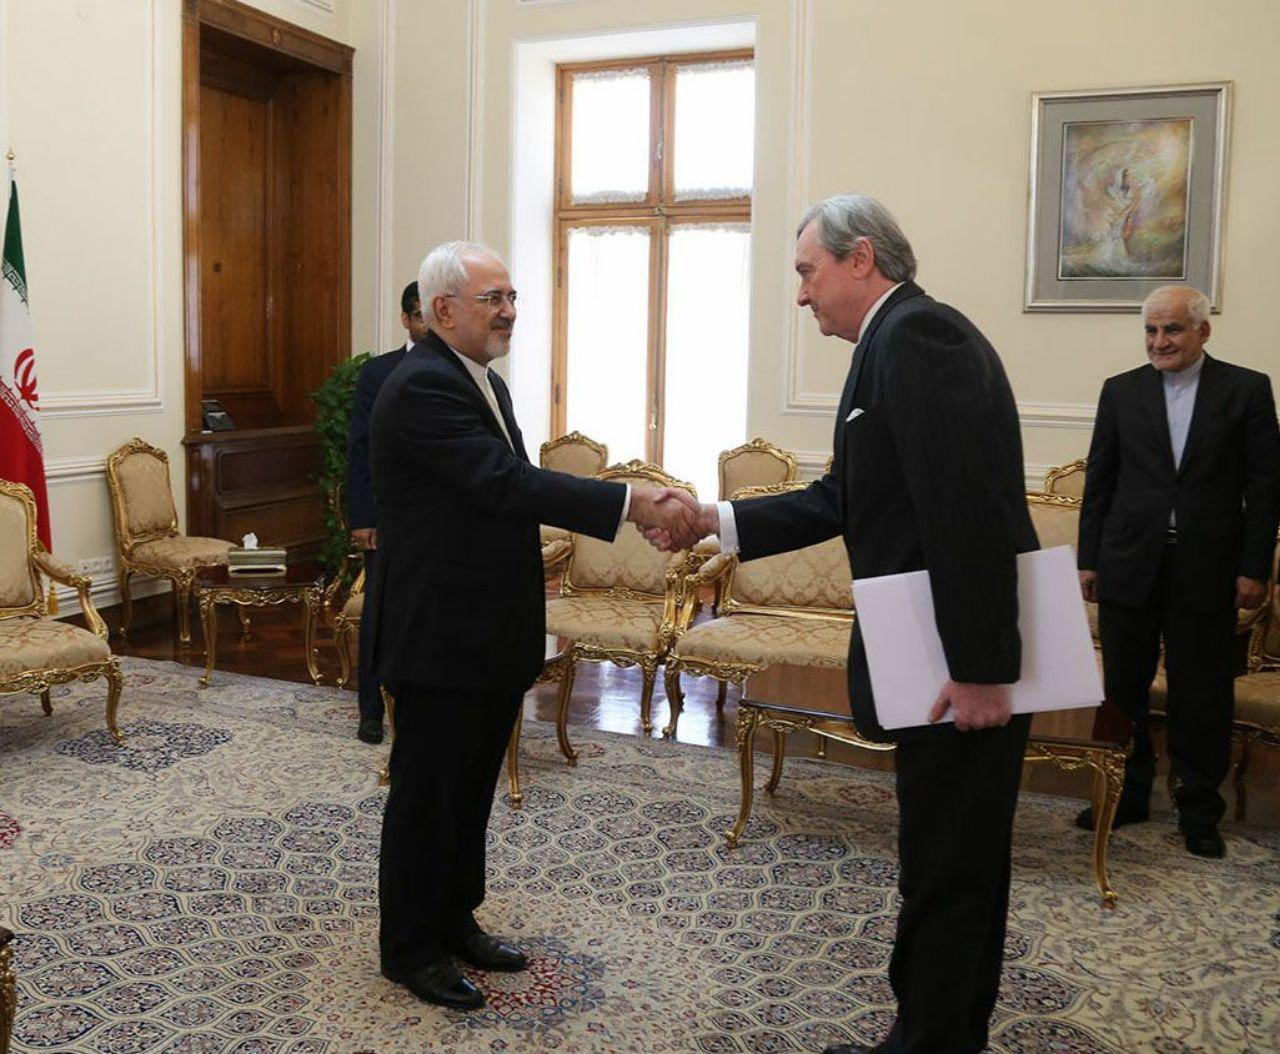 وزير خارجية ايران يلتقي بسفيري الاورغواي وفنلندا - 1